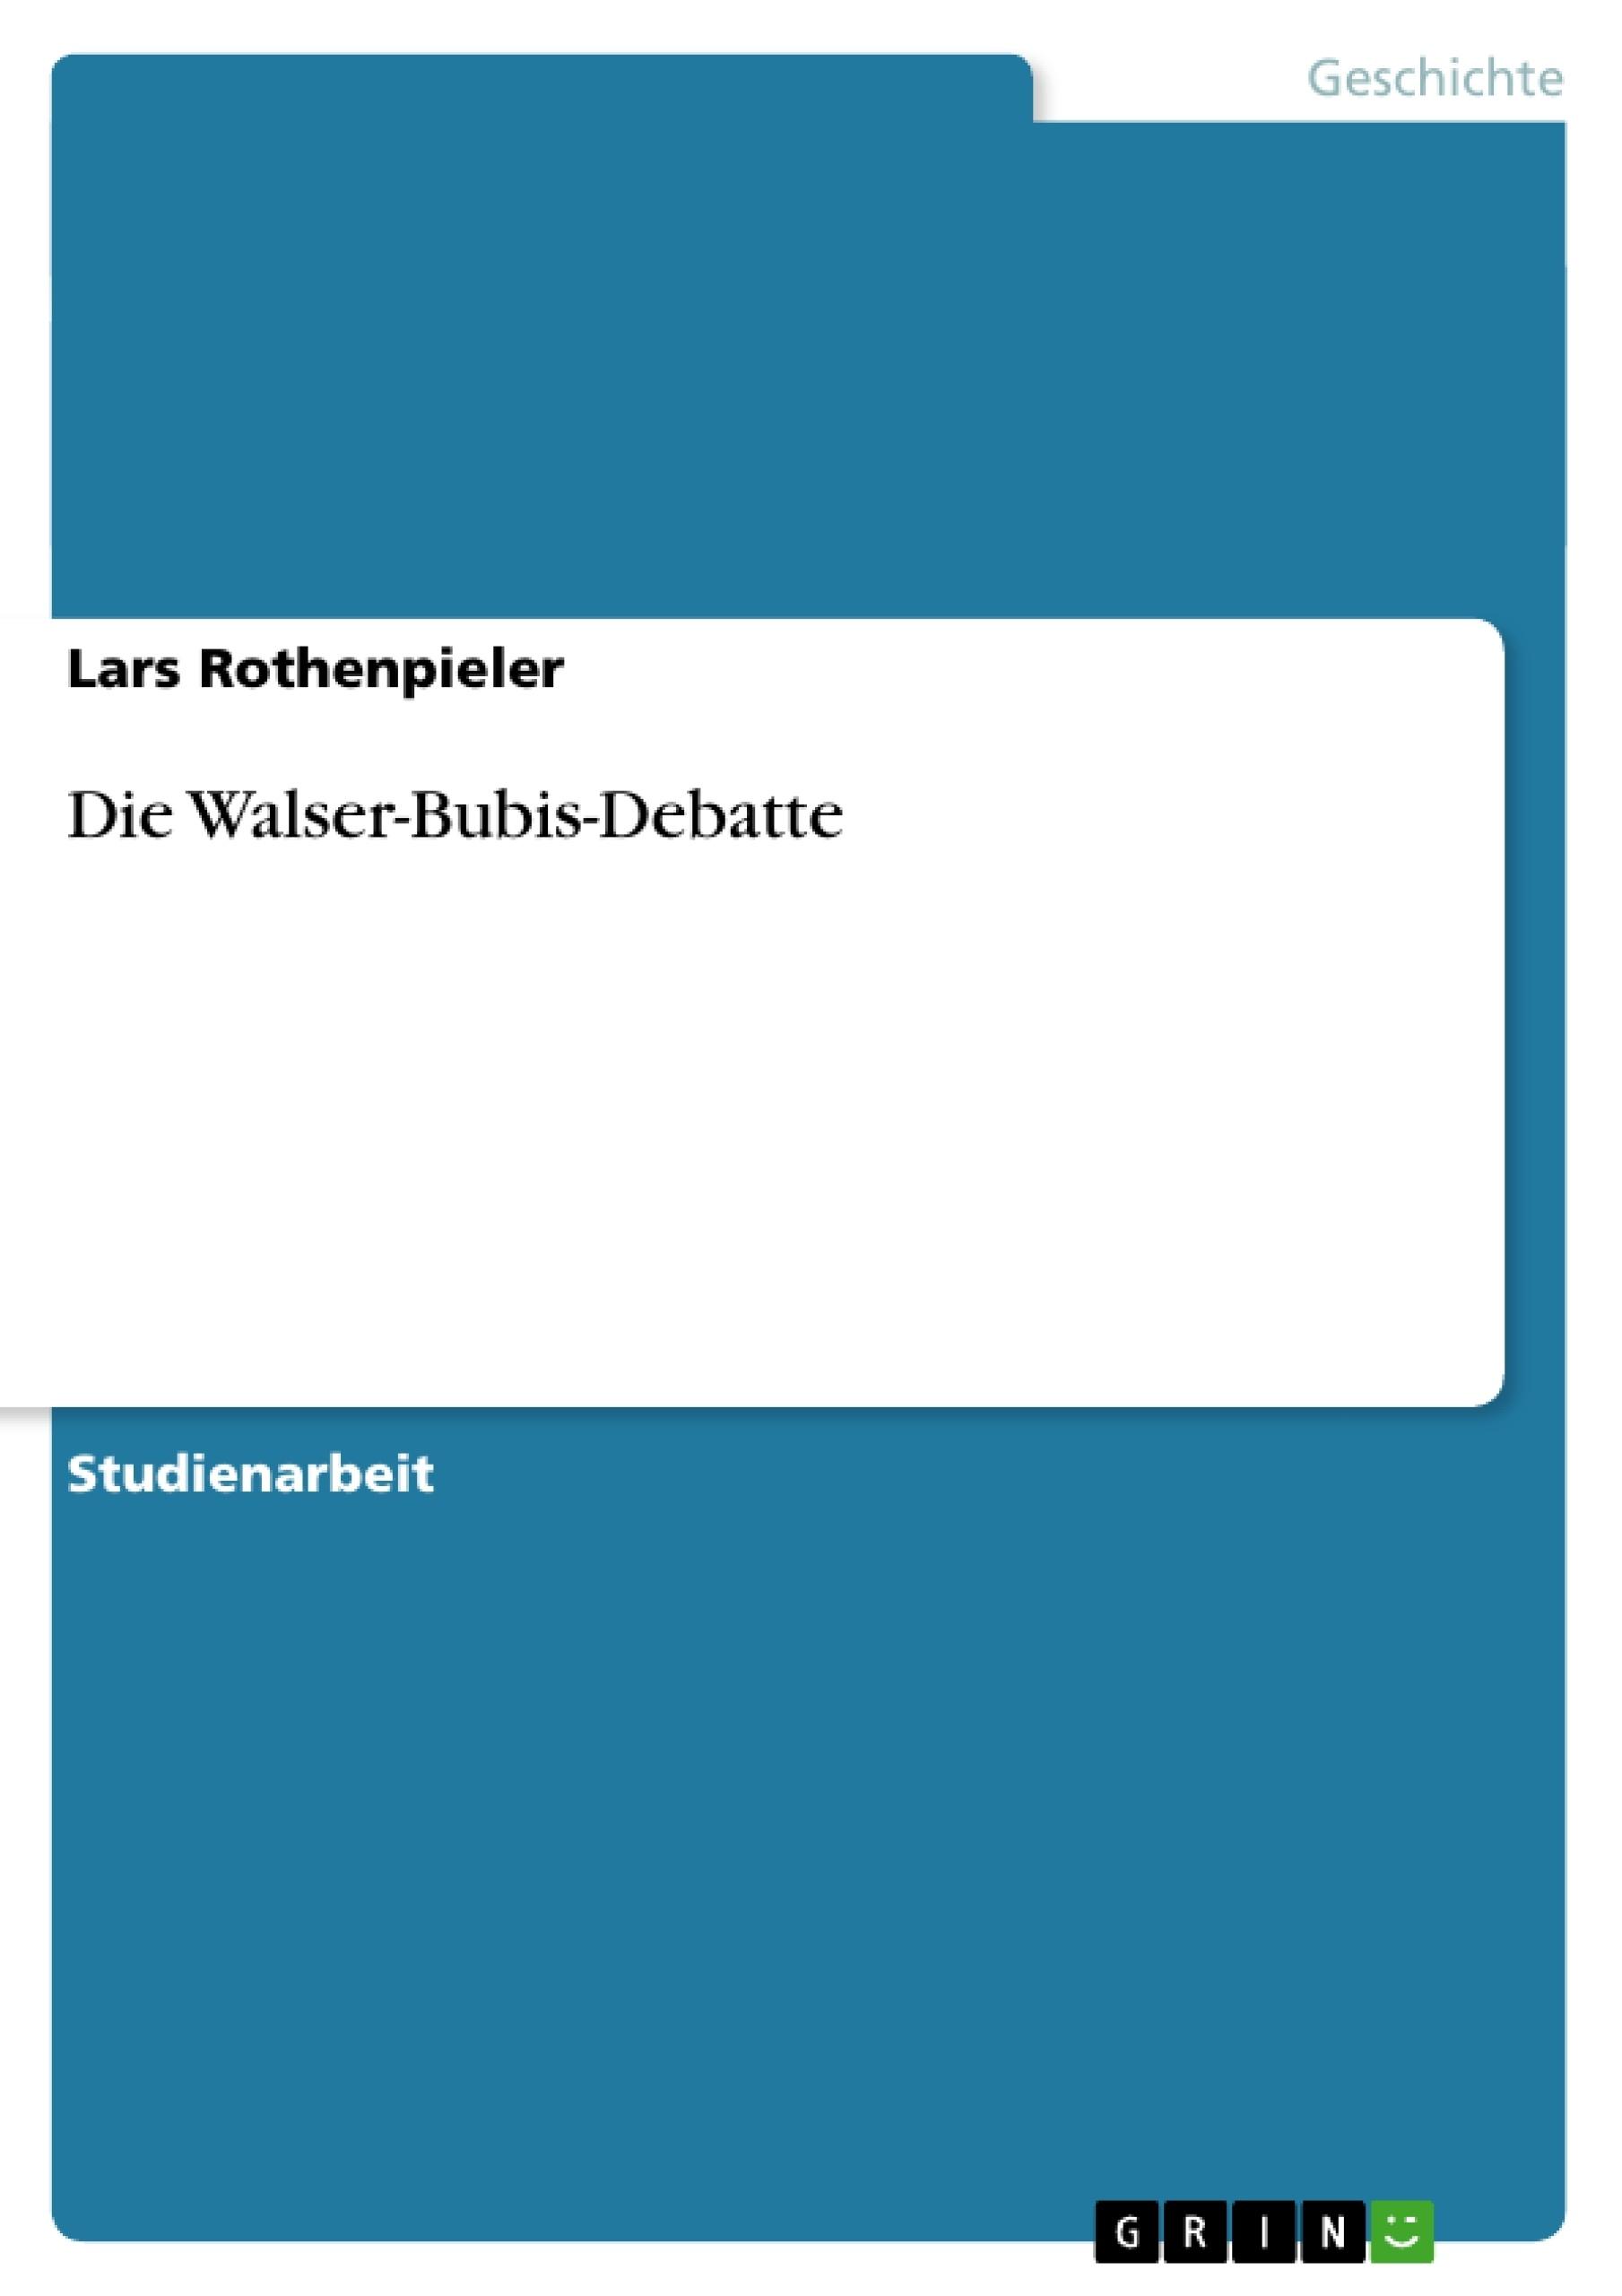 Titel: Die Walser-Bubis-Debatte